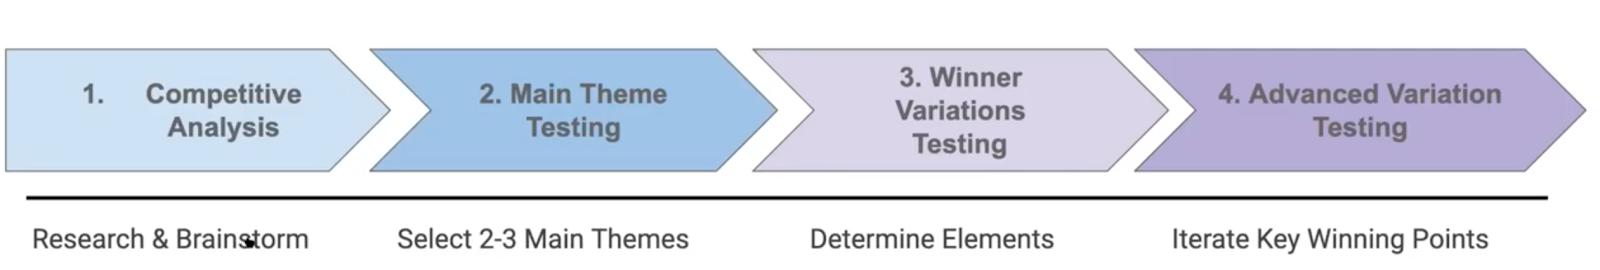 PM-Creative-Test-Framework.png